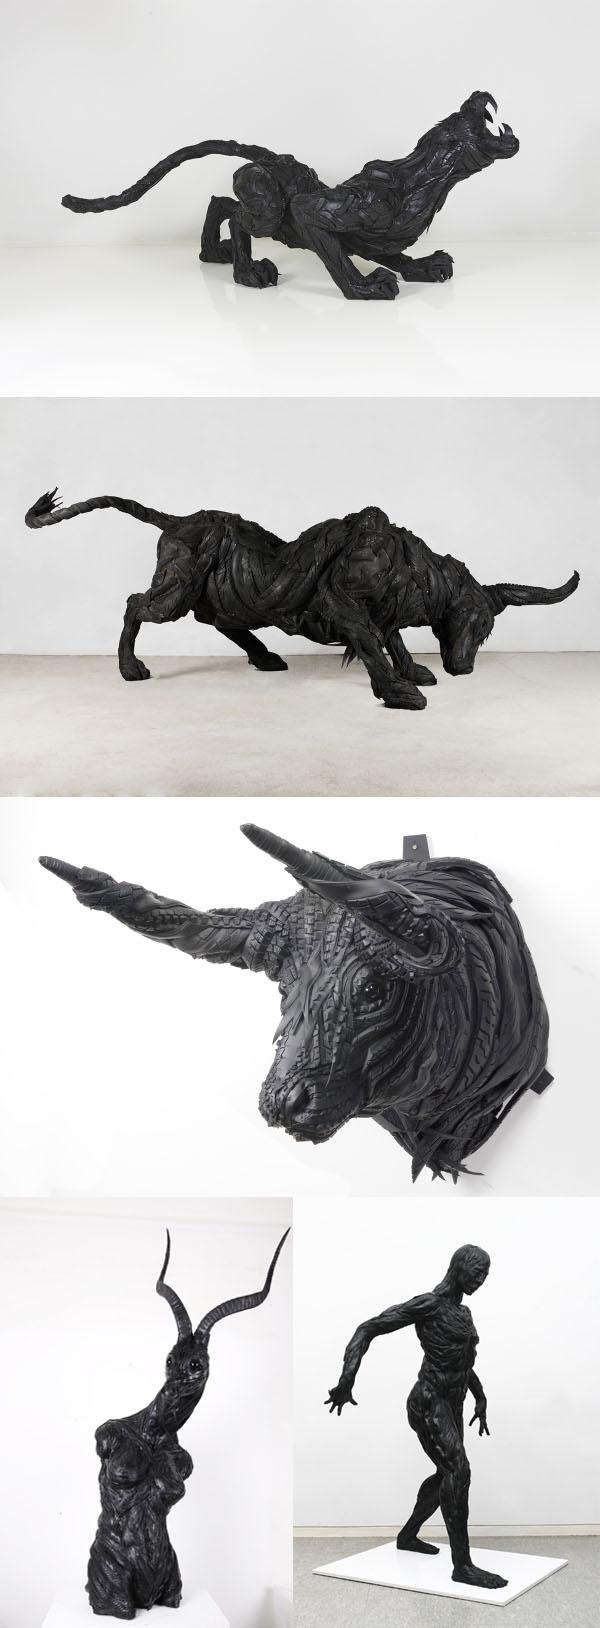 Yong Ho Ji - Sculptures en gomme de pneu